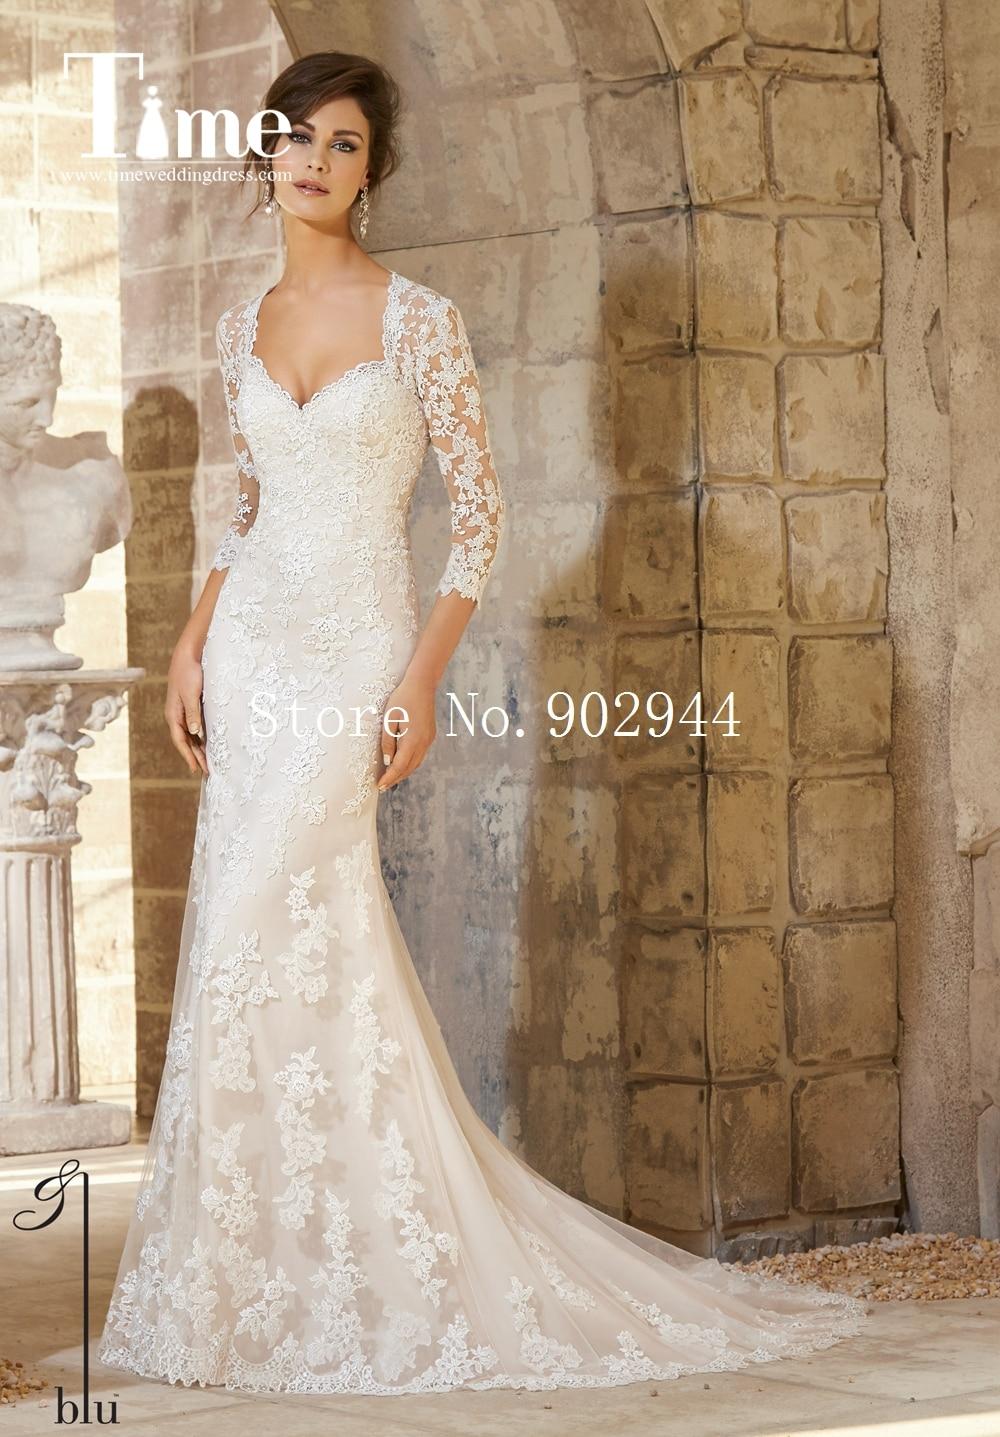 madison james mj heart shaped wedding dress Madison James MJ Wedding Dress